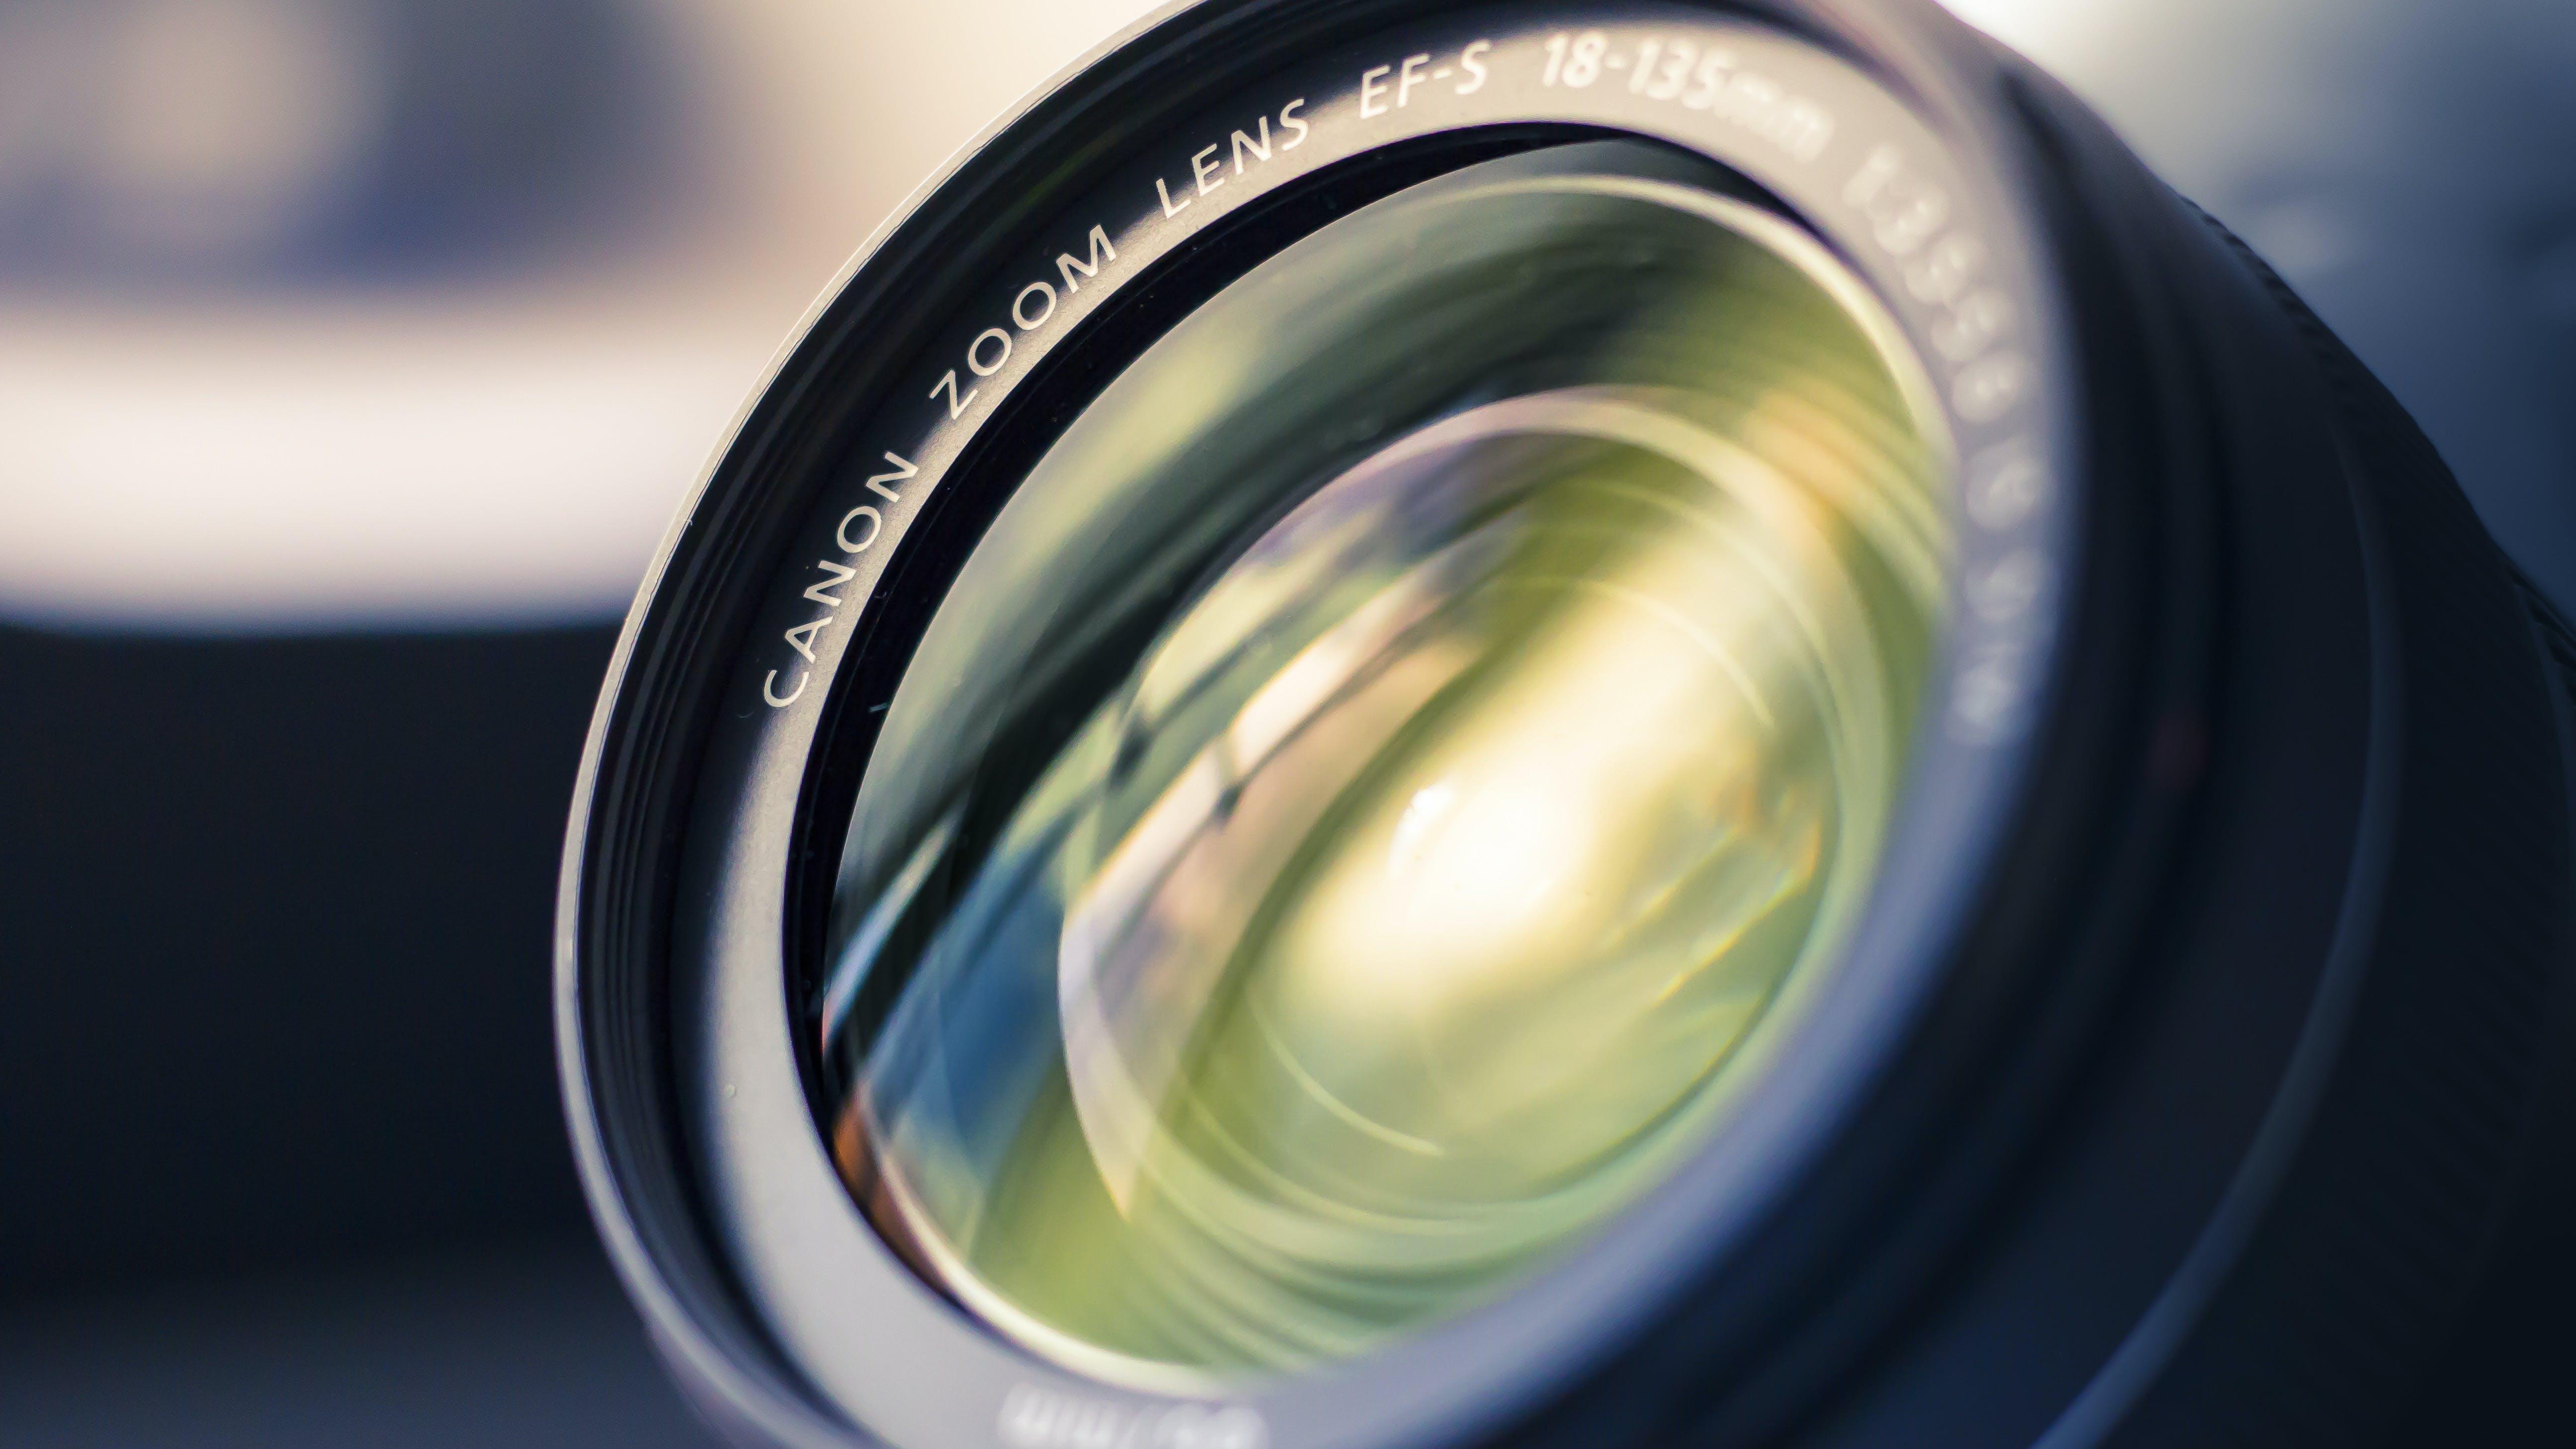 Gratis stockfoto met camera, cameralens, canon, digitaal